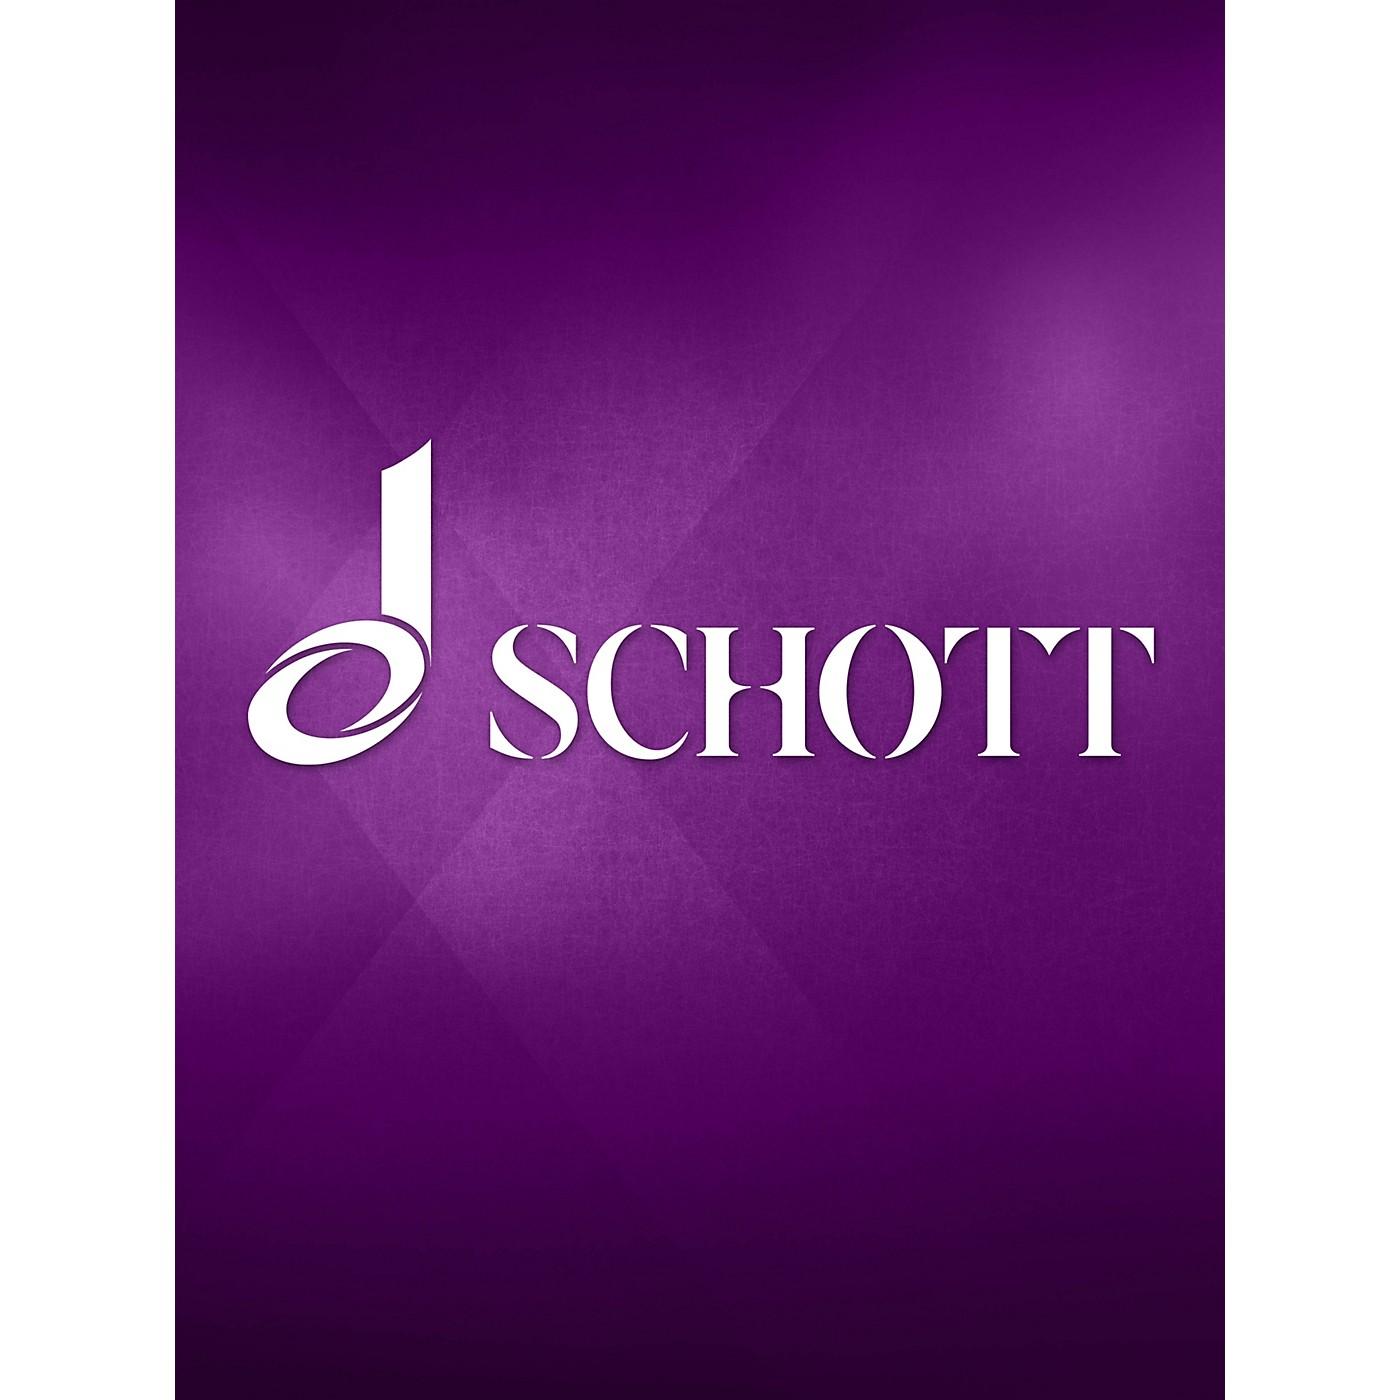 Schott Trio For Violin Cello And Piano Schott Series thumbnail